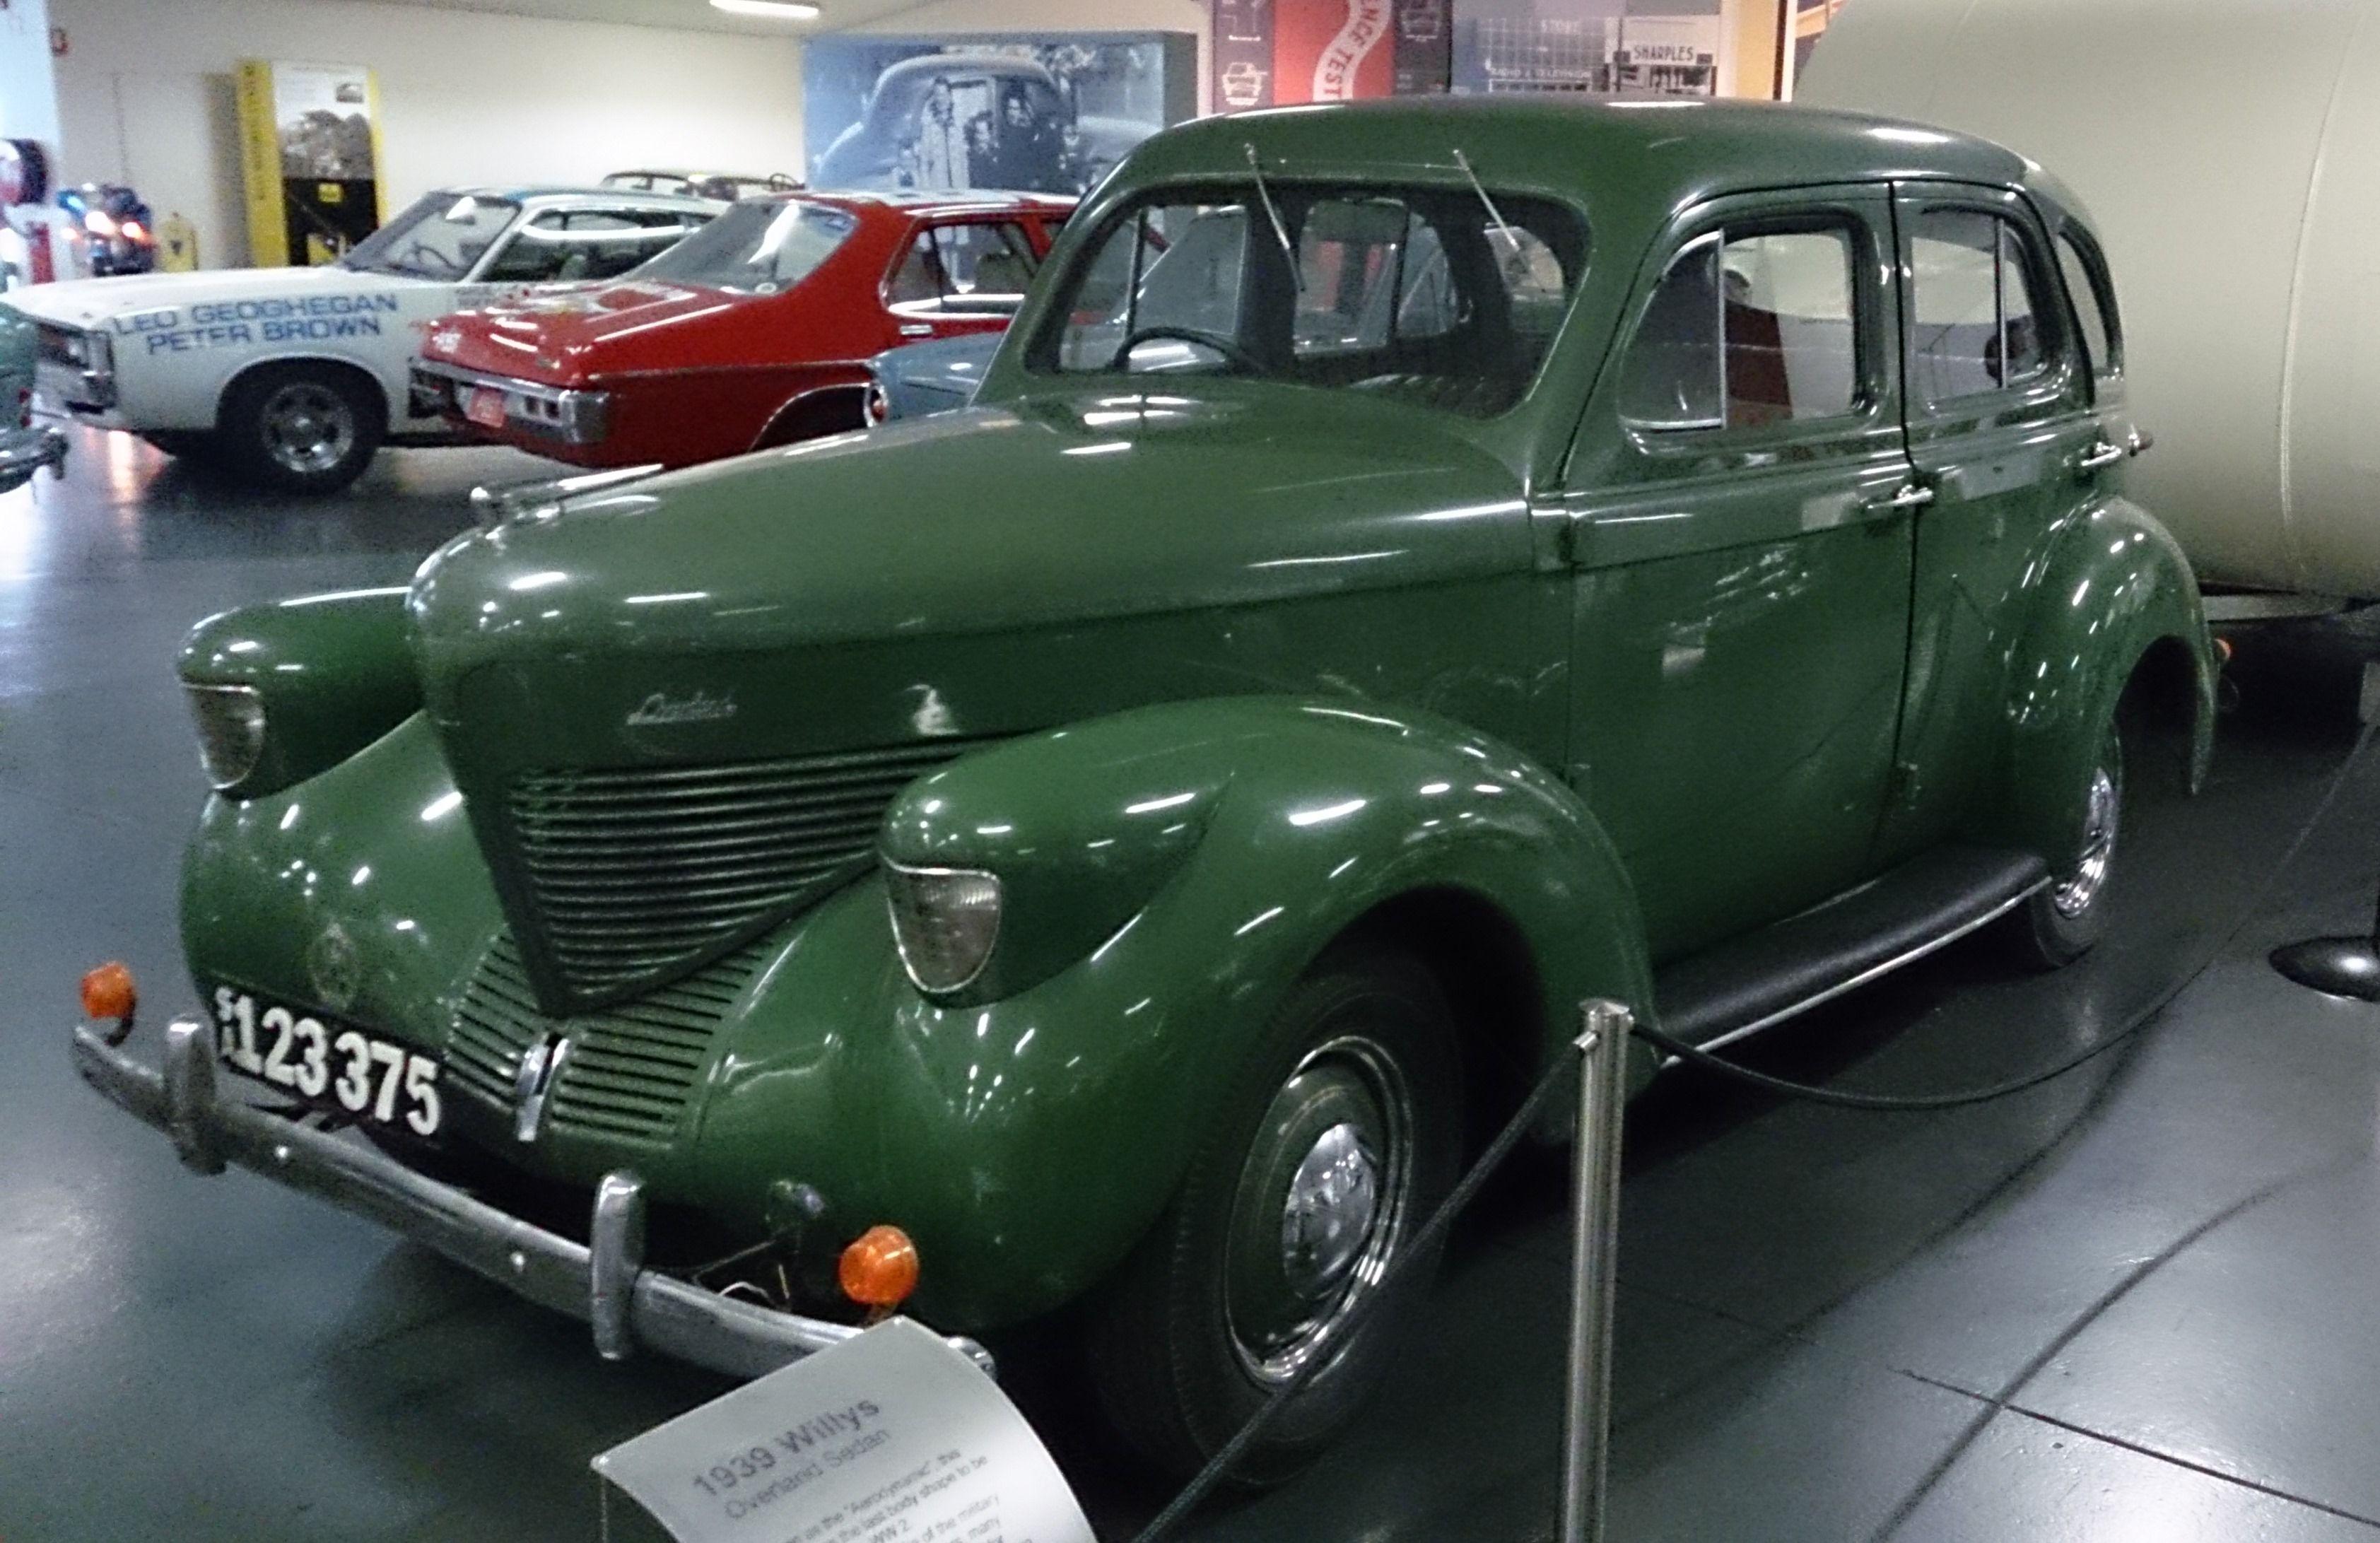 Willys Overland 4 Door Sedan Model 39 1939 This Example Has A